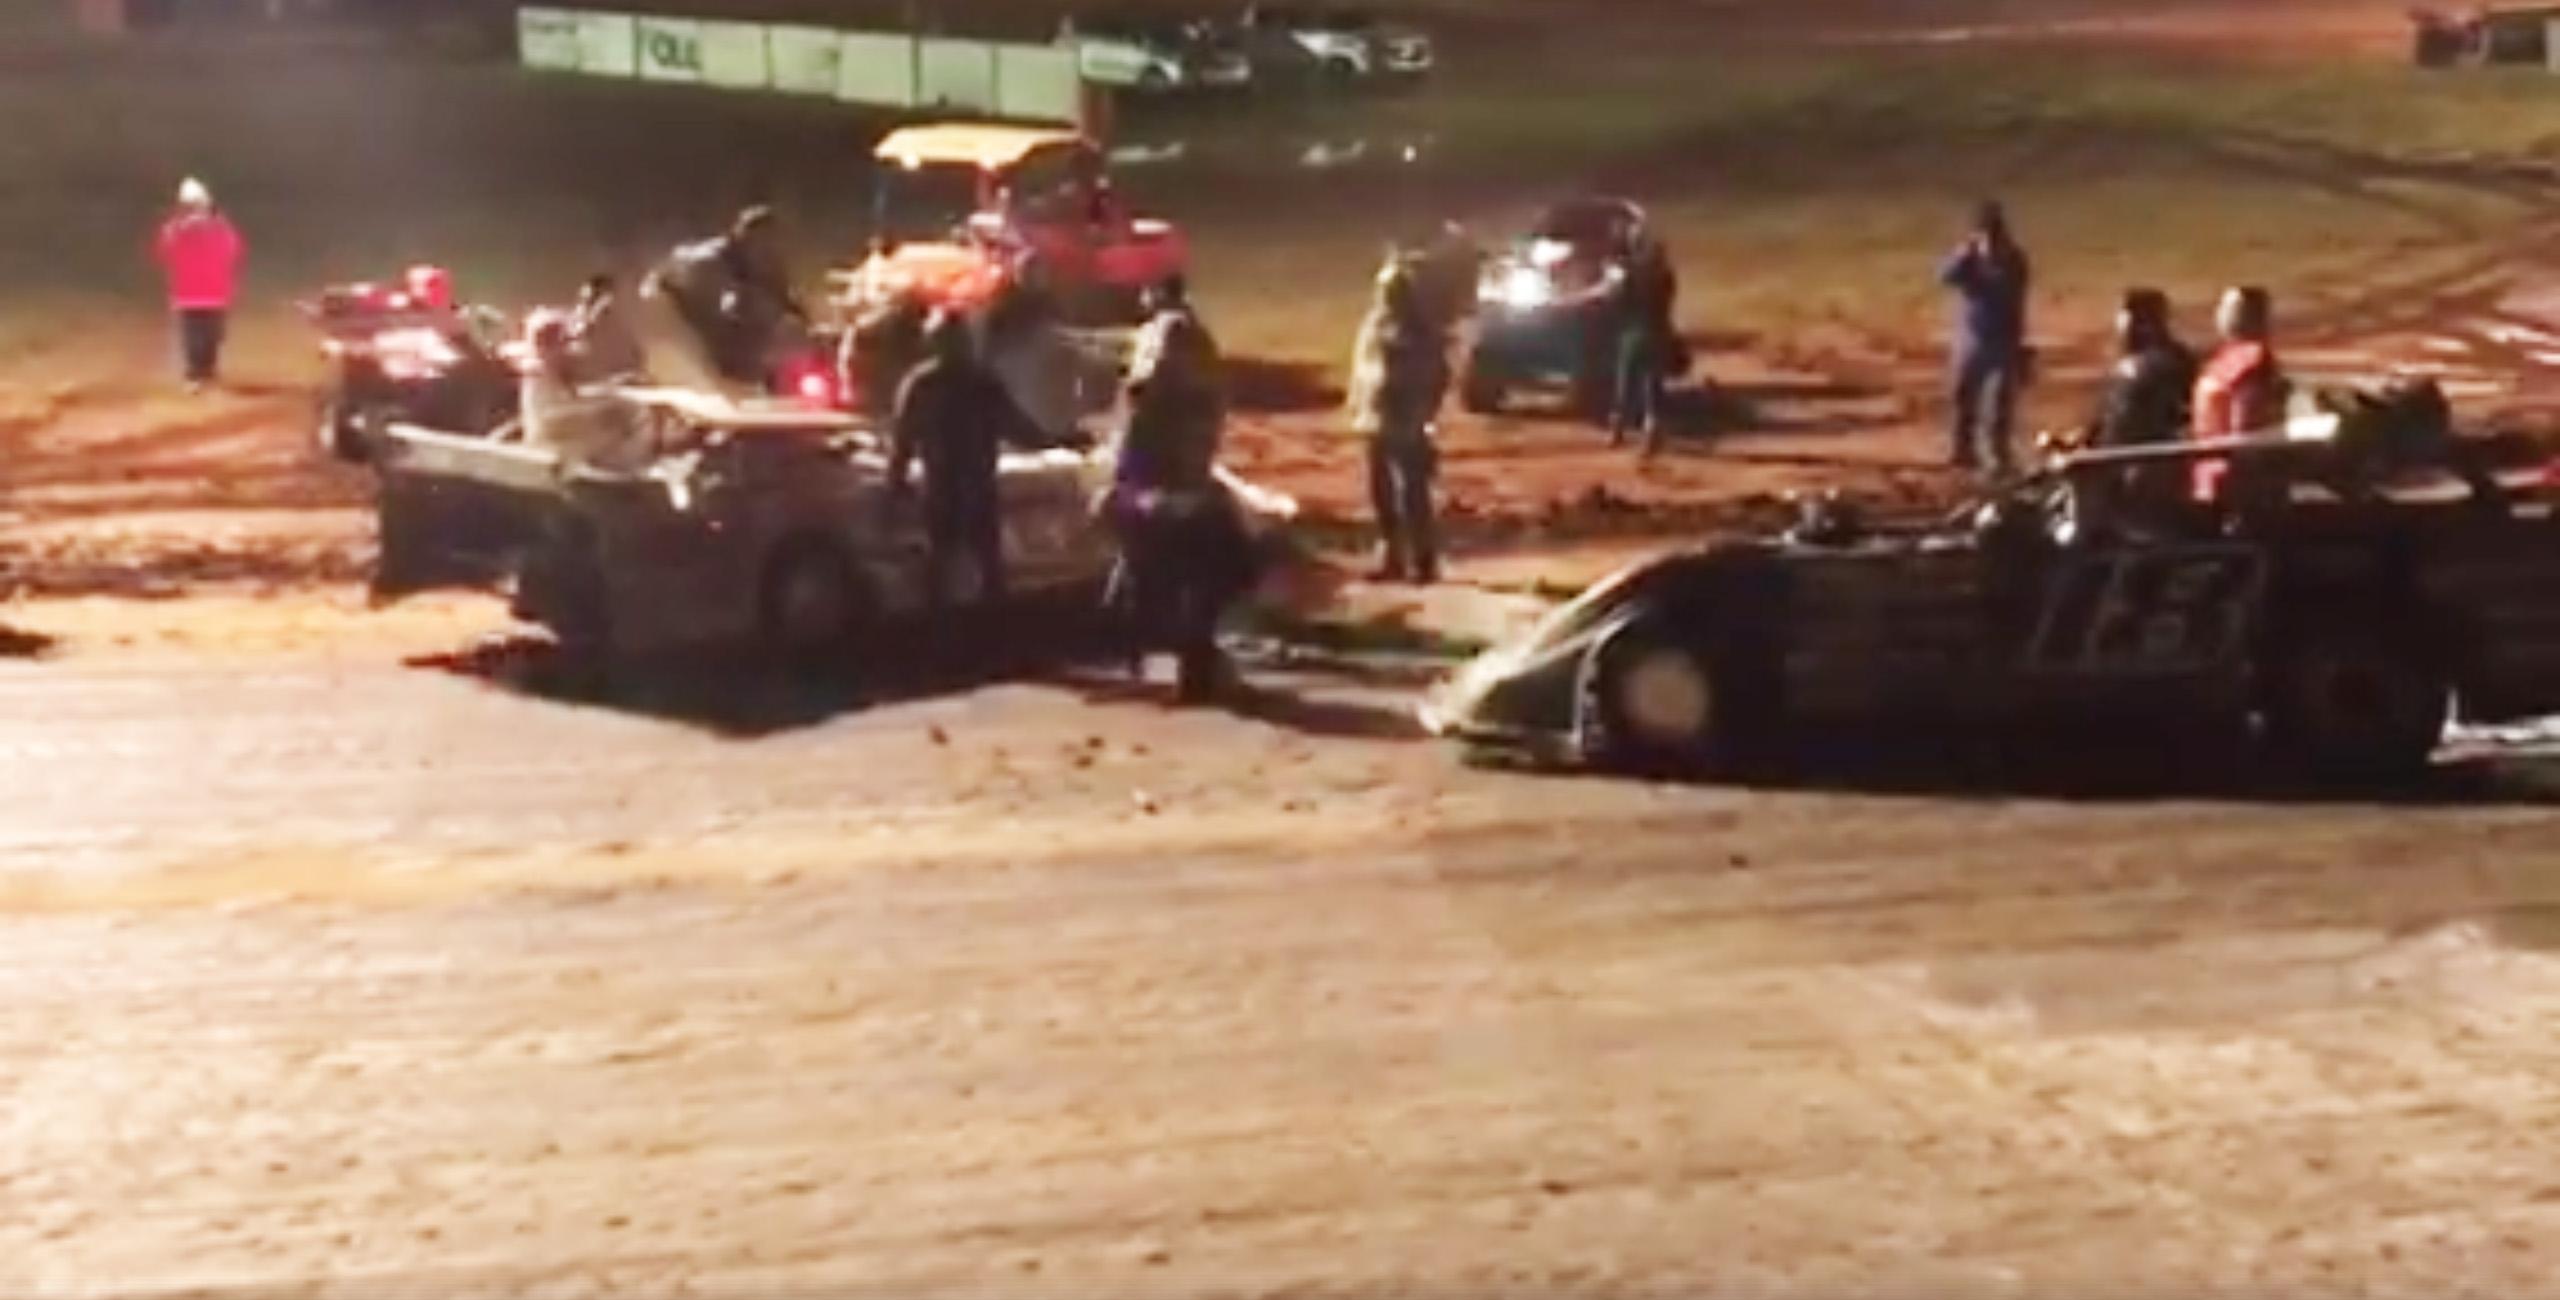 Jack Sullivan vs Cade Dillard - Driver flipped, under caution